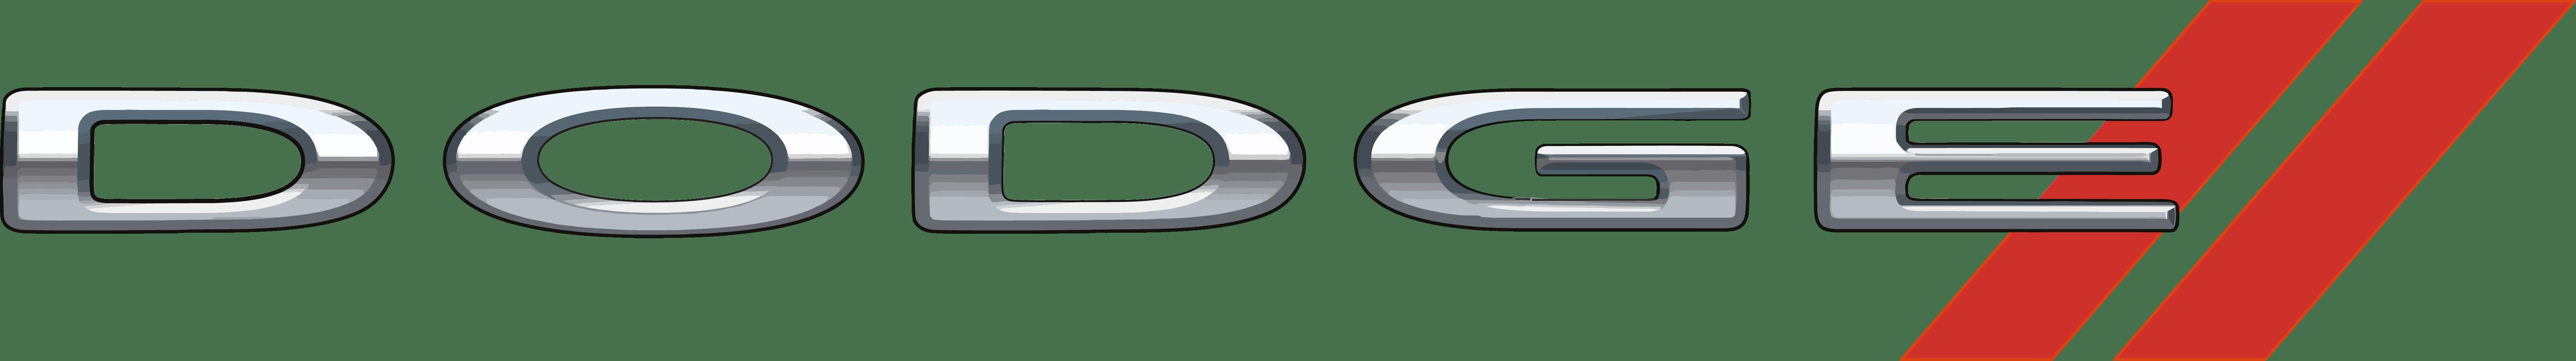 dodge logo vector eps free download logo icons clipart rh freelogovectors net dodge logo vector art dodge ram logo vector